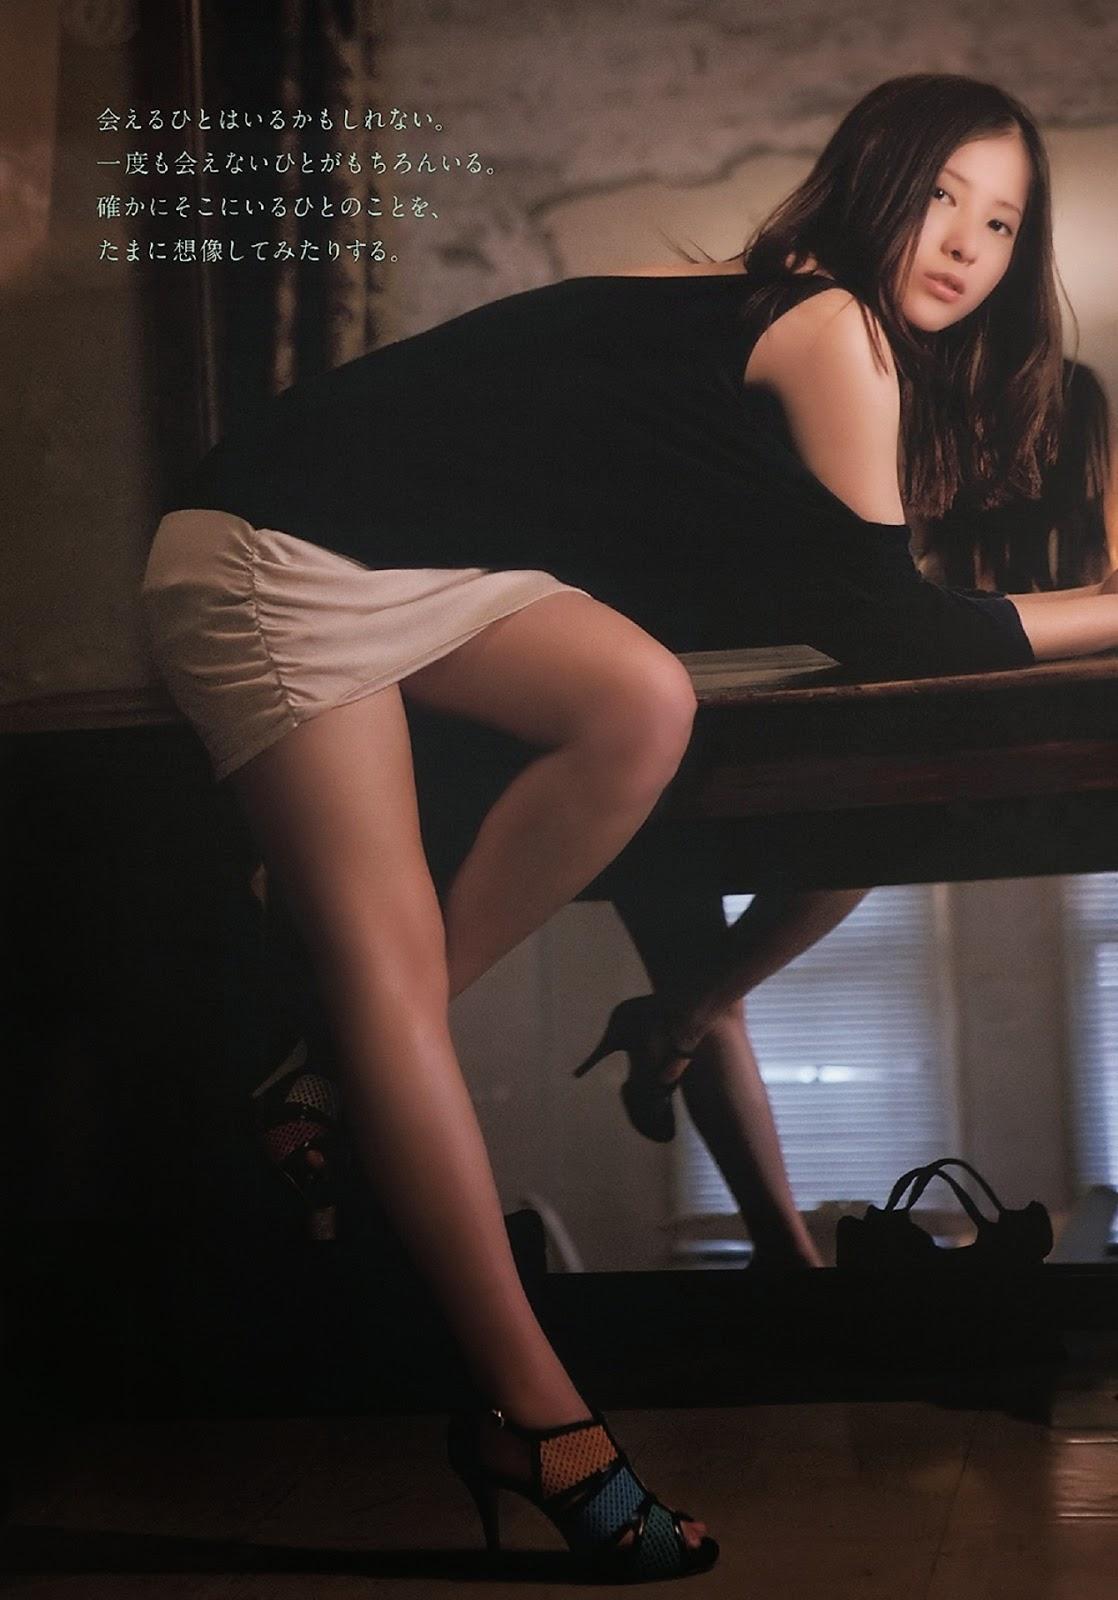 Yuriko Yoshitaka 吉高由里子 Weekly Playboy No 15 2011 Images 2